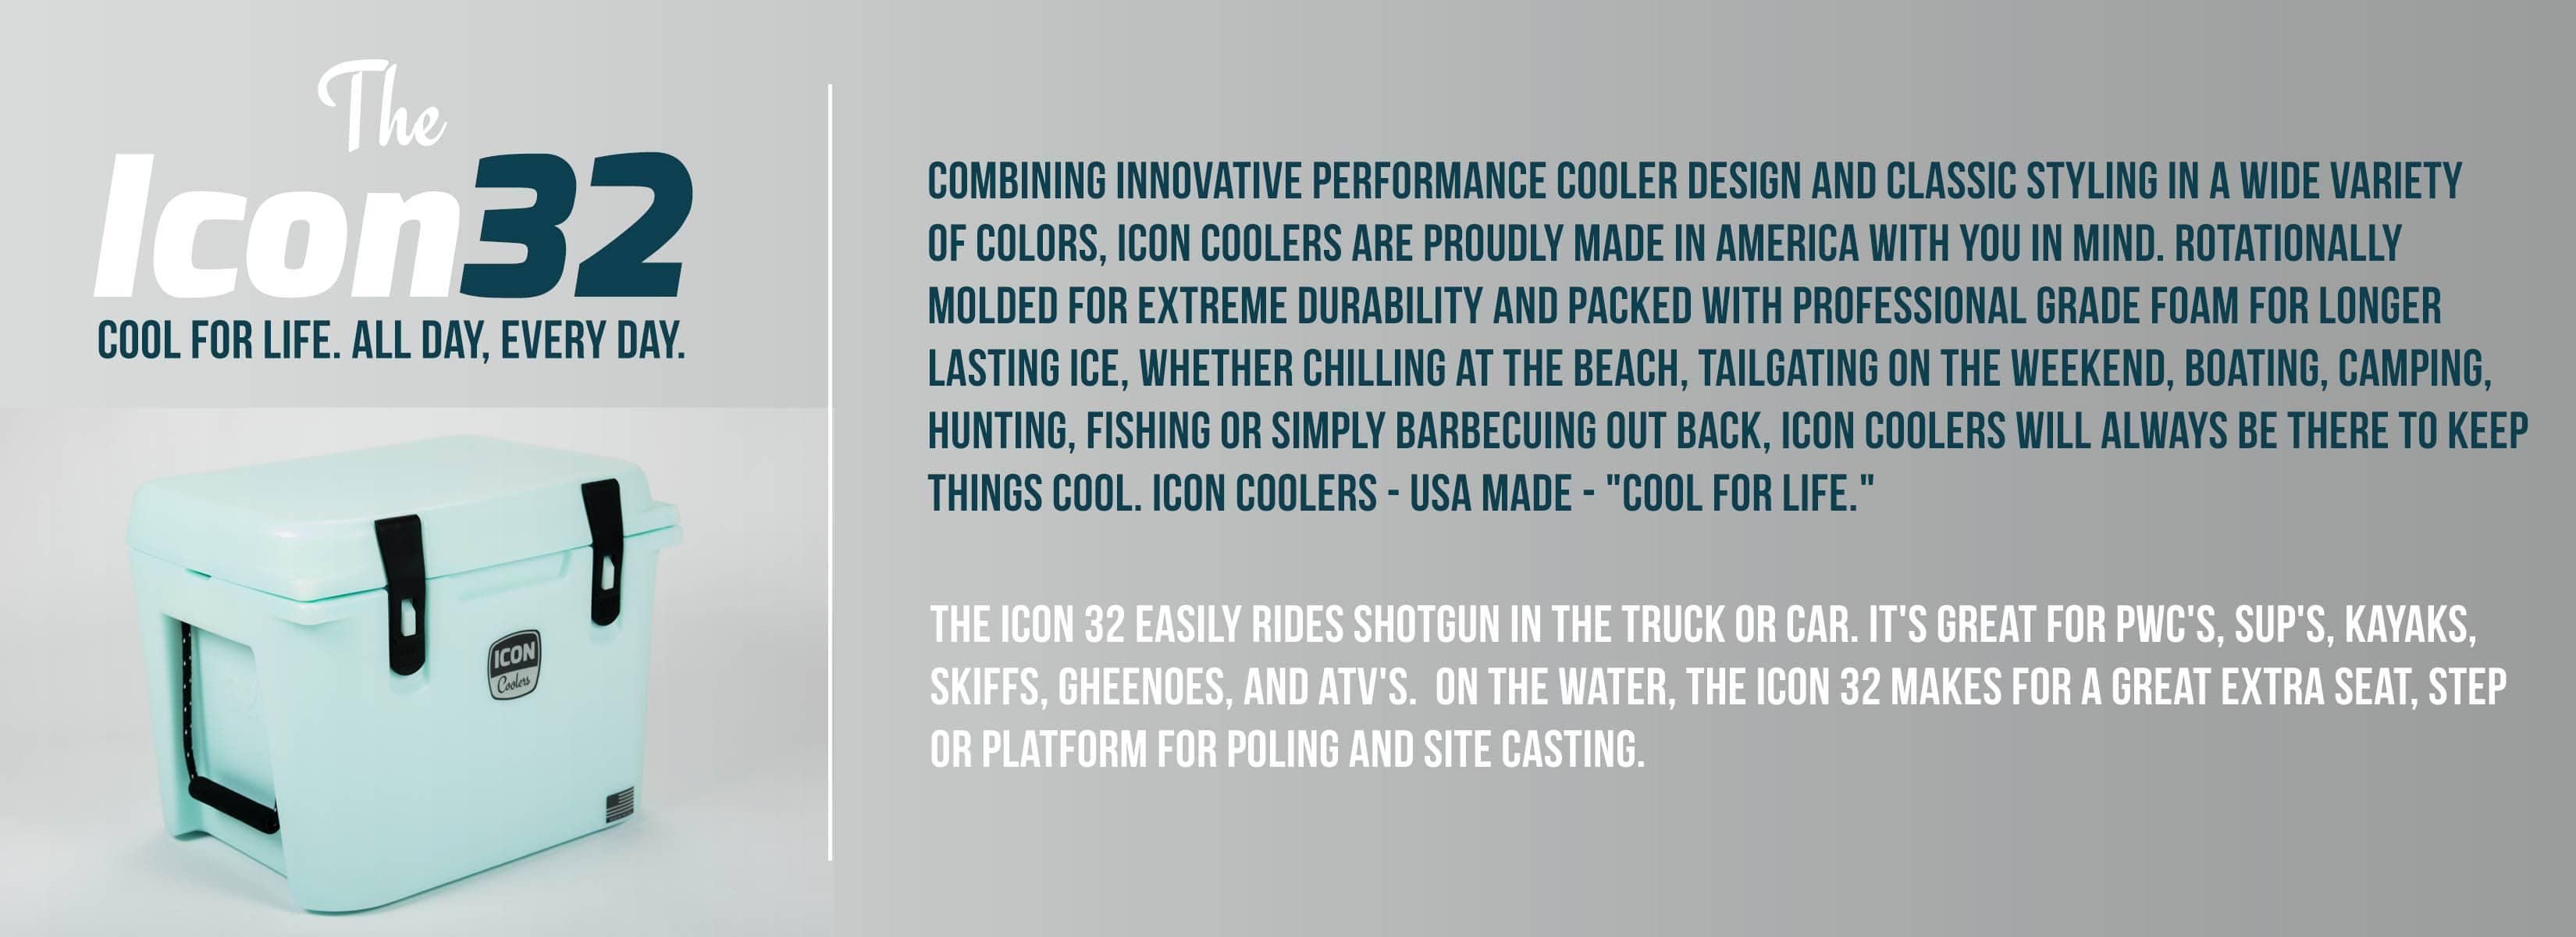 icon-hard-cooler-32-subcat-header1-min.jpg